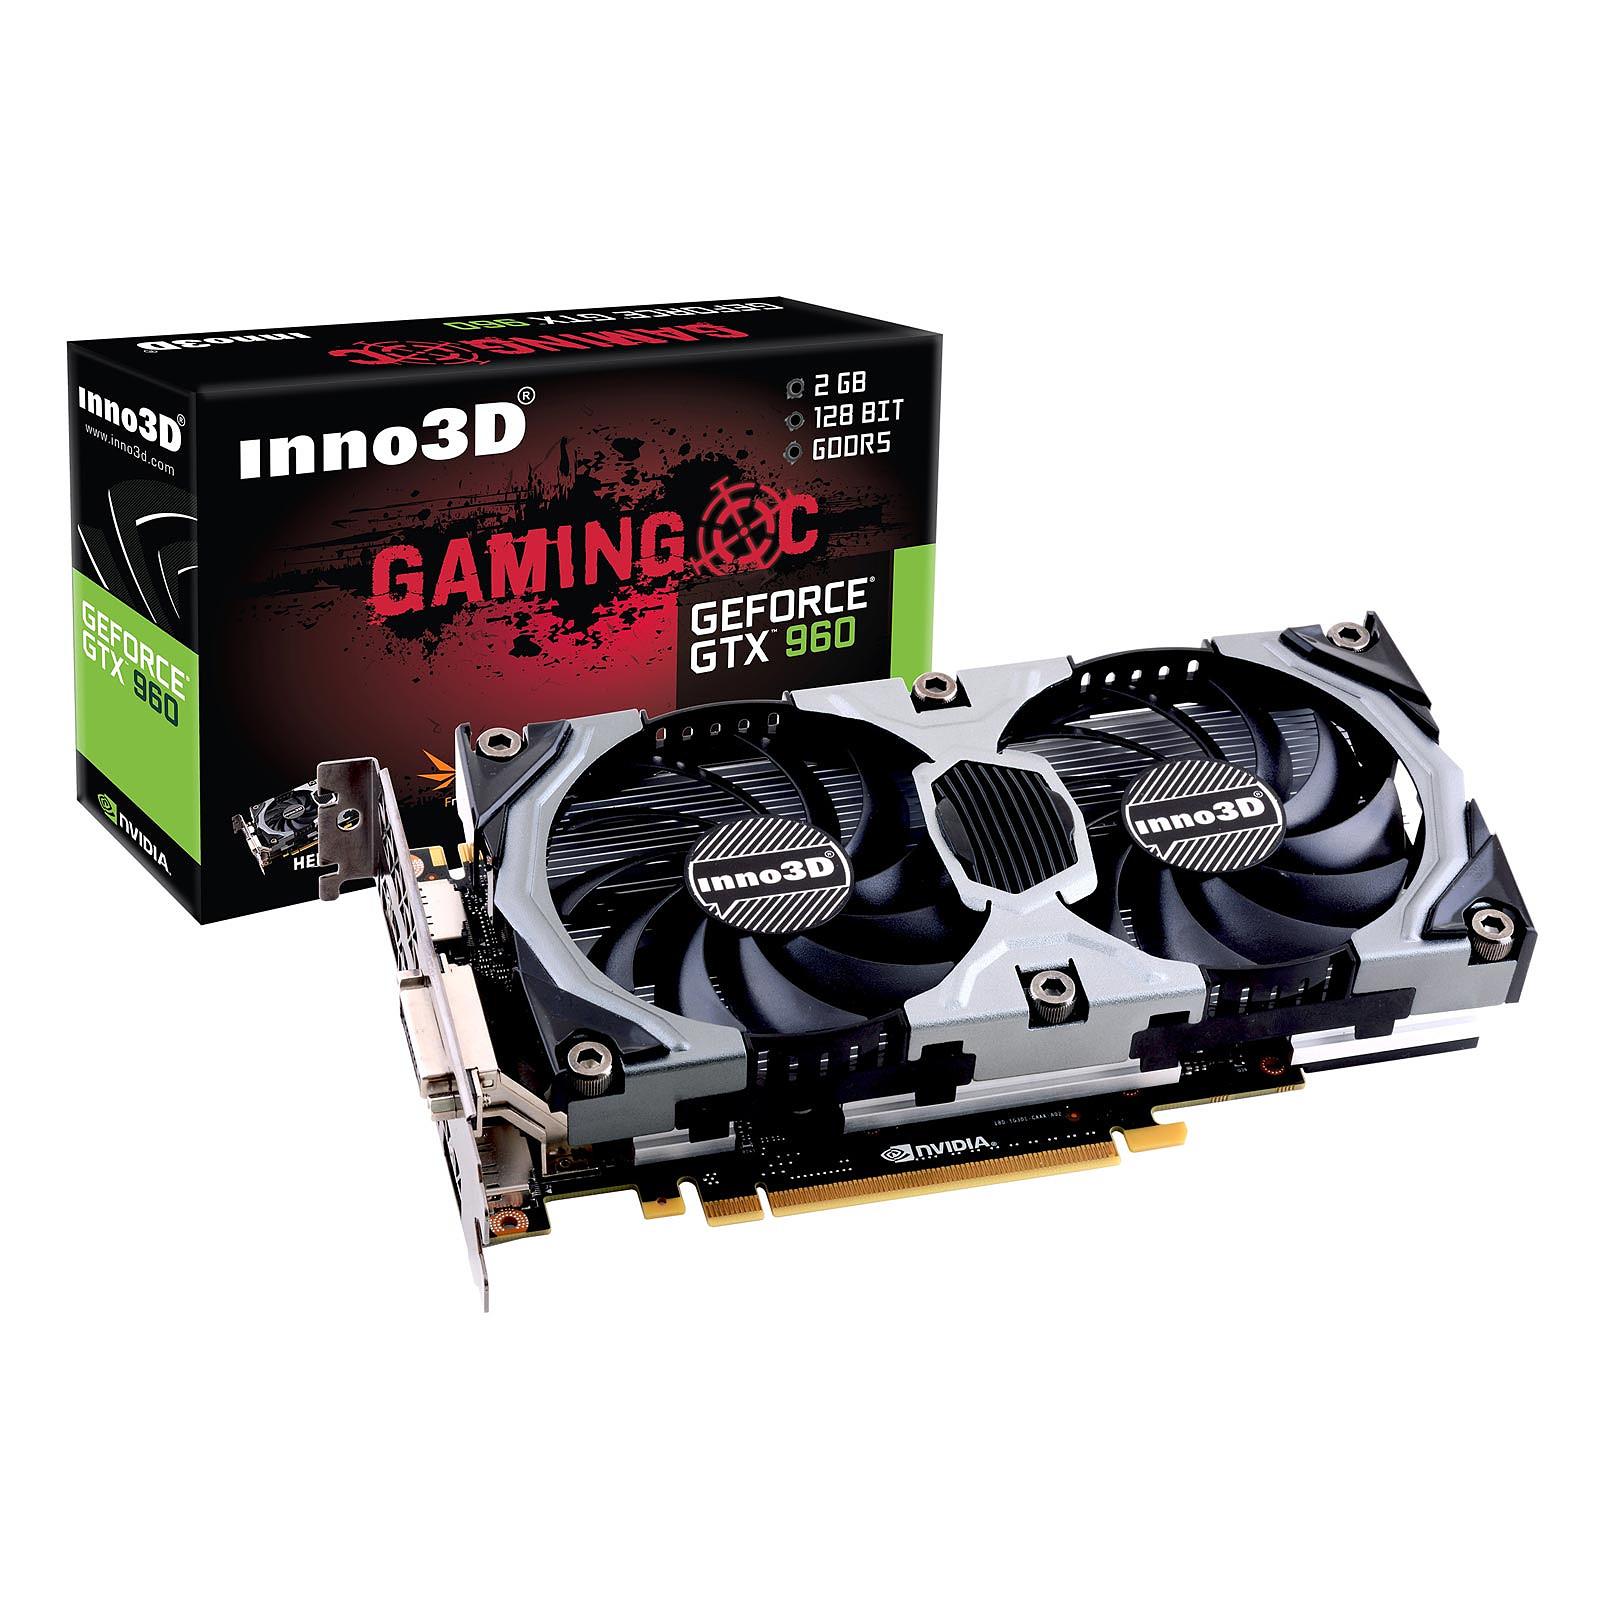 Inno3D GeForce GTX960 2GB OC